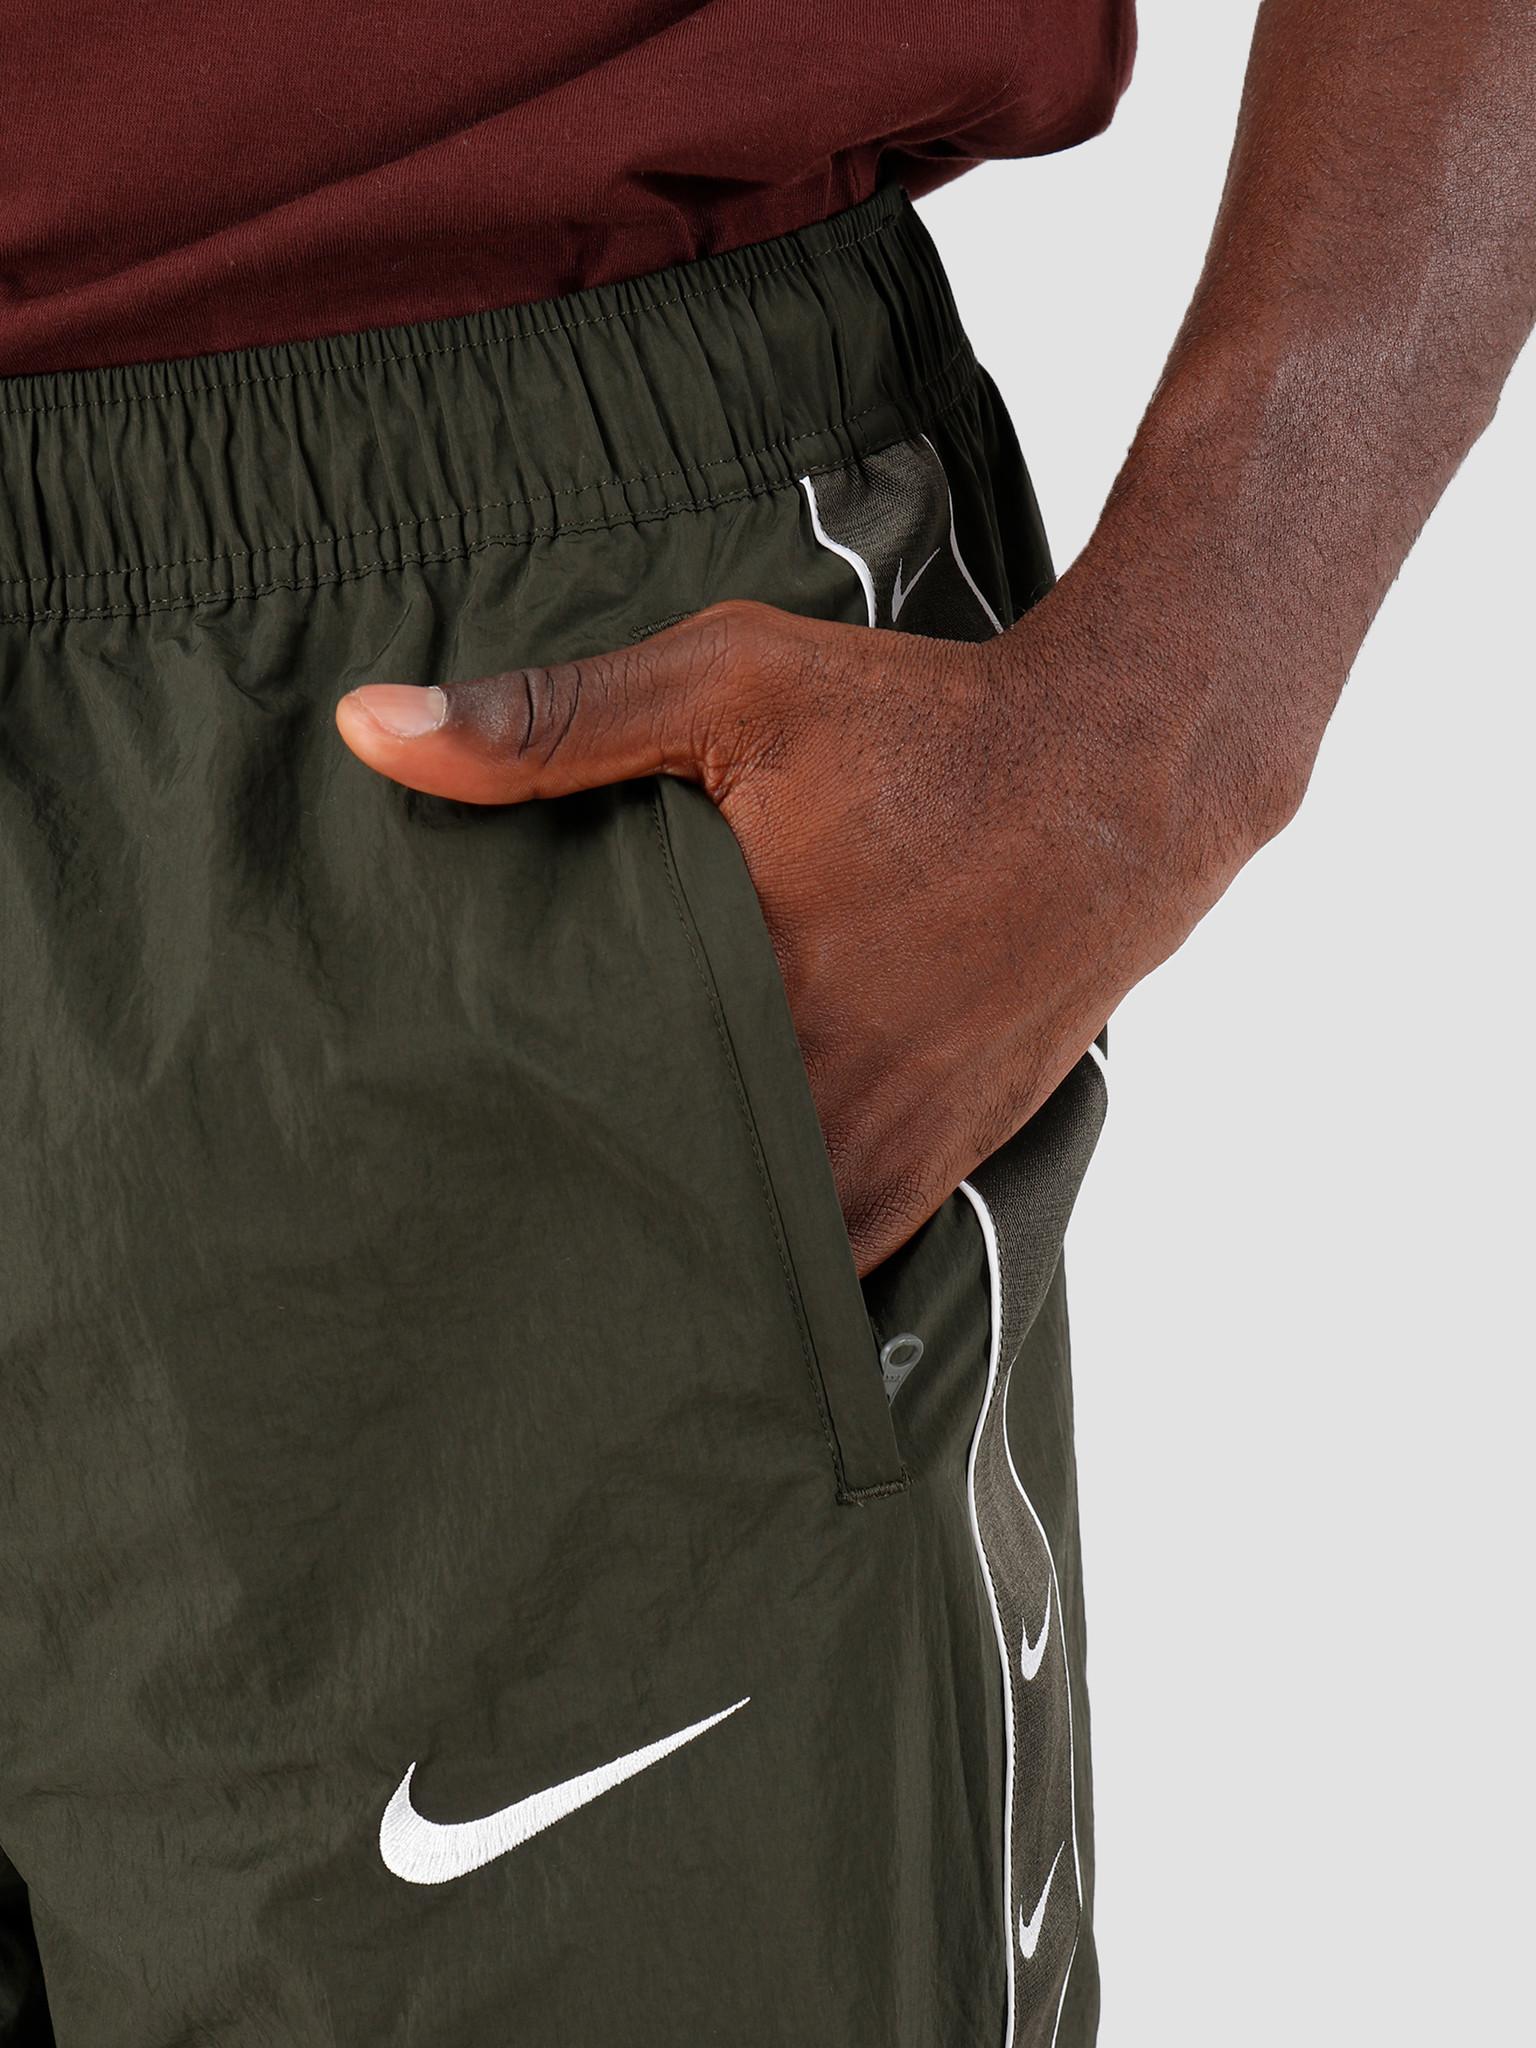 Nike Nike Sportswear Swoosh Pants Sequoia White Cd0421-356